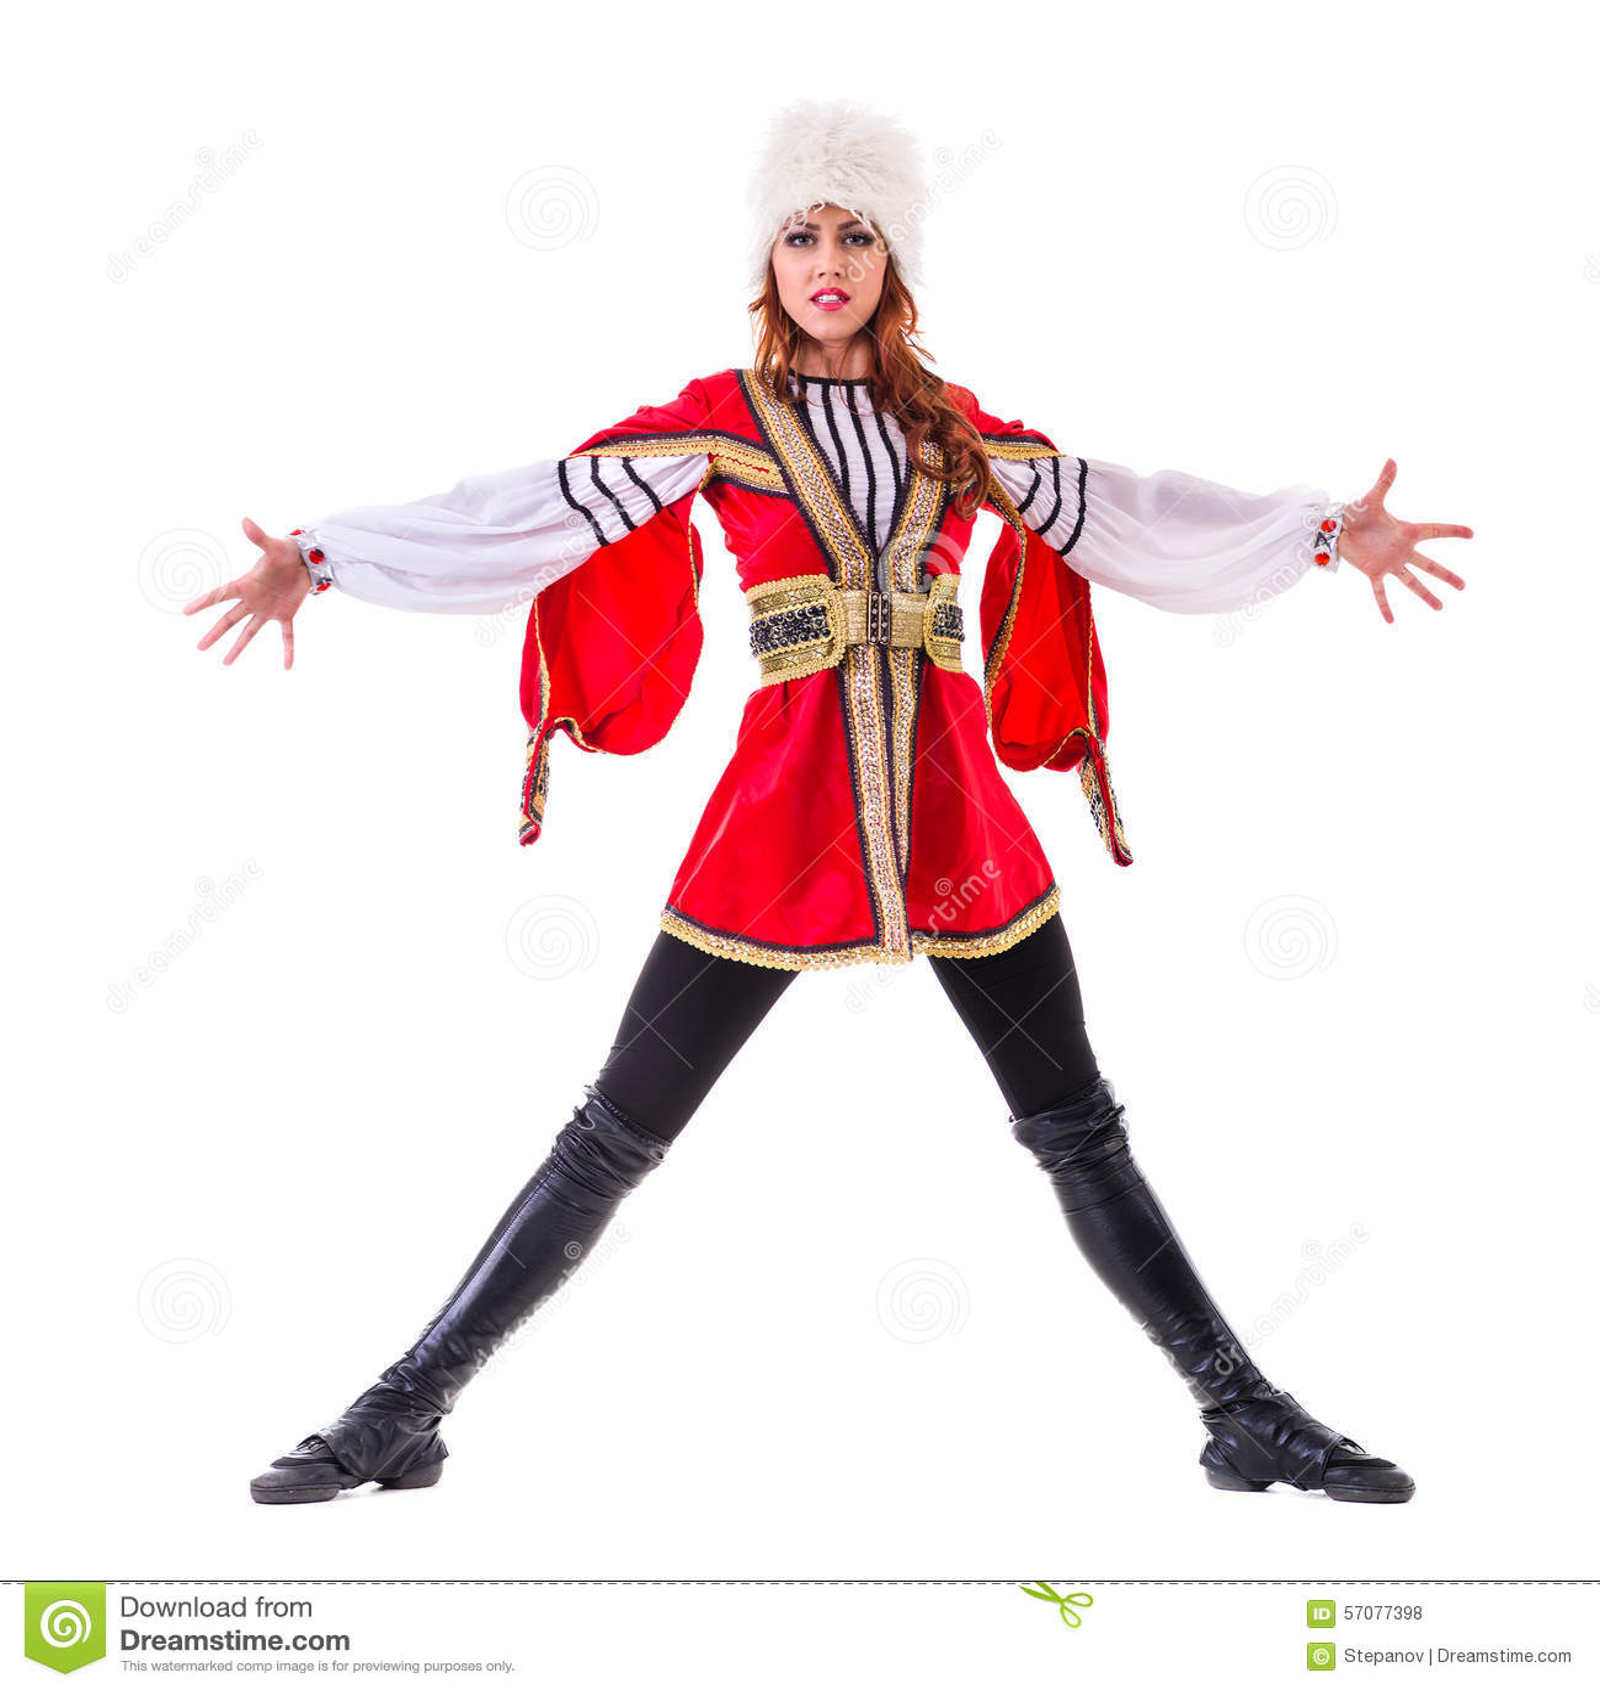 How to dance lezginka